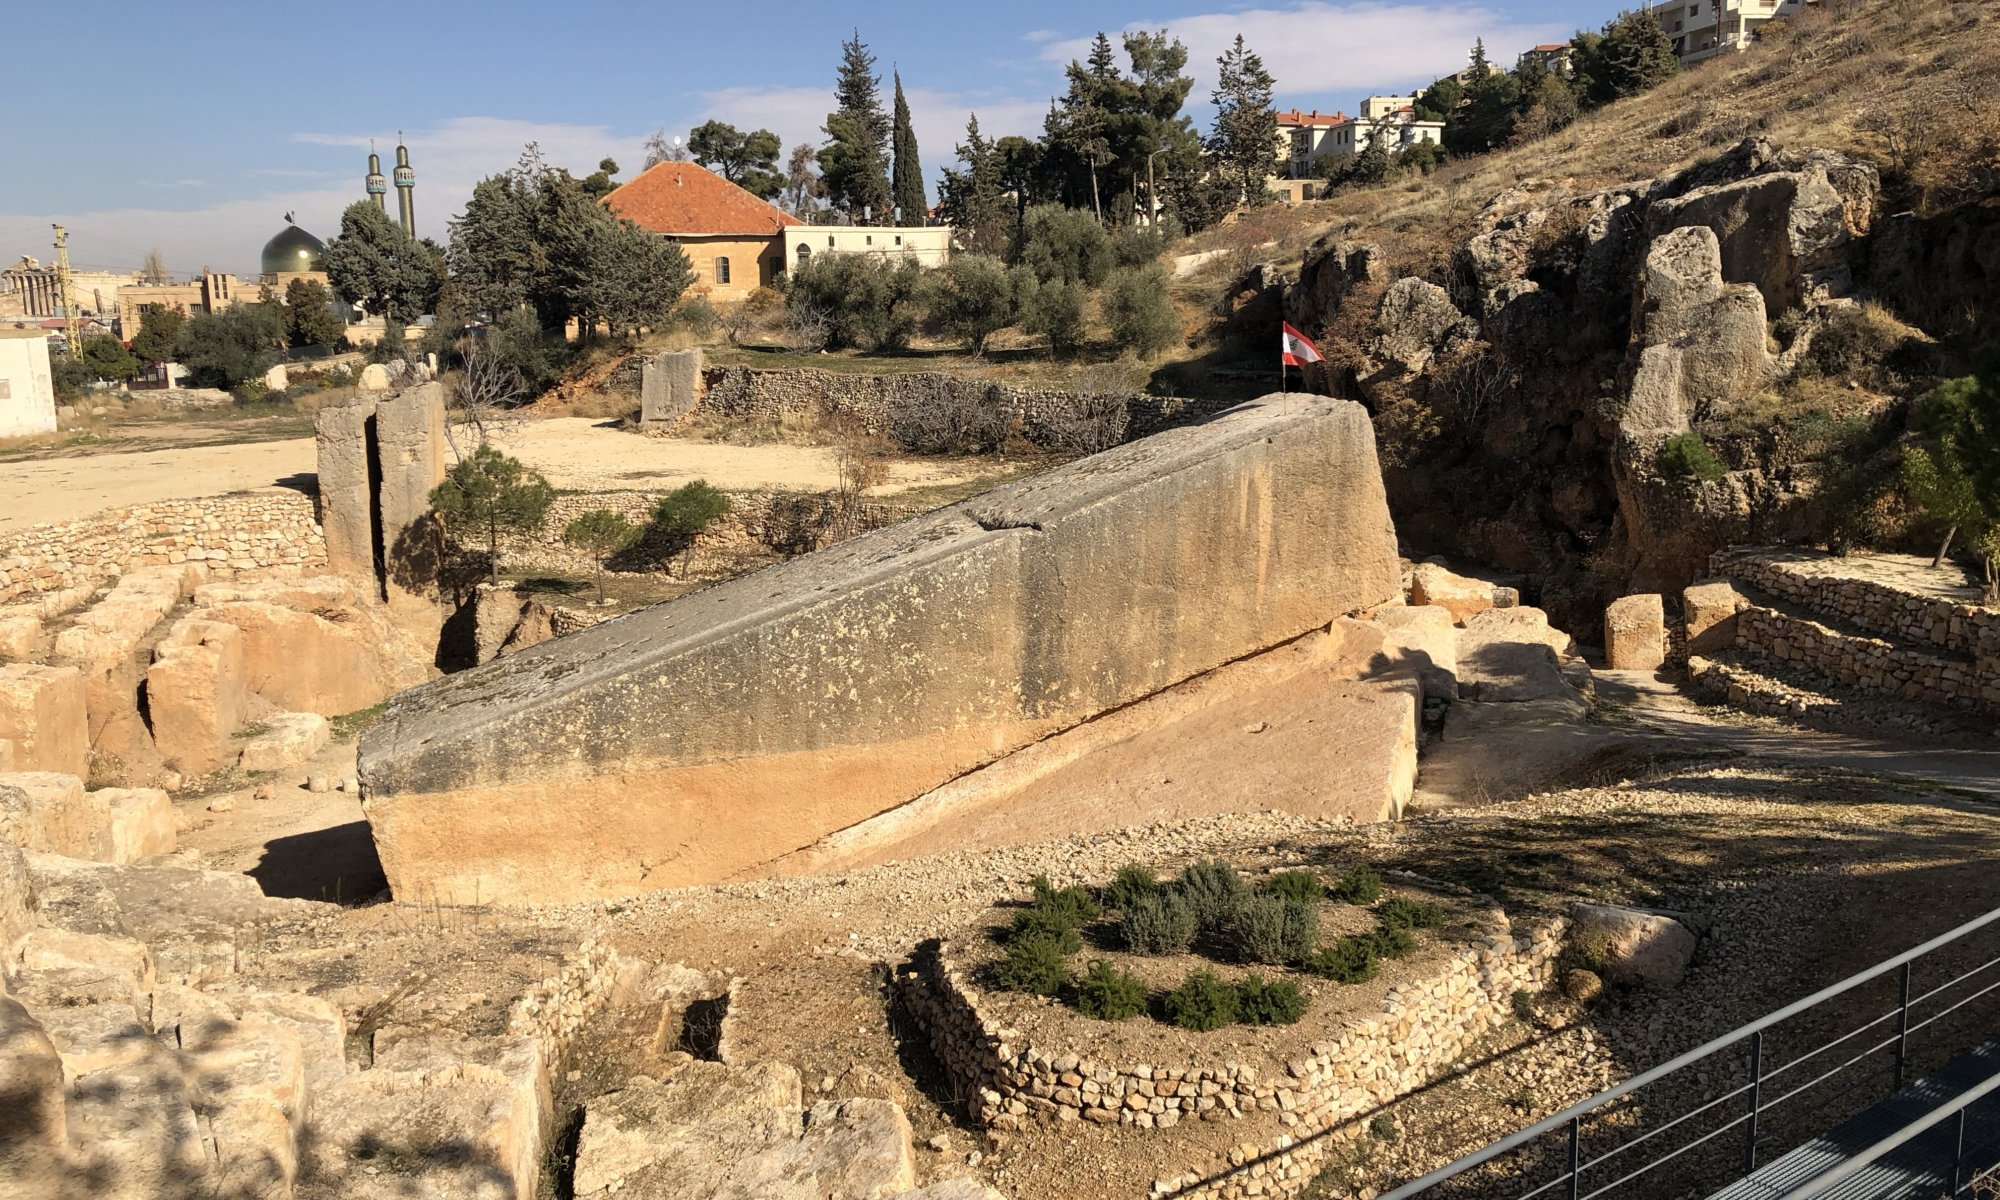 Worlds largest stone, Baalbek